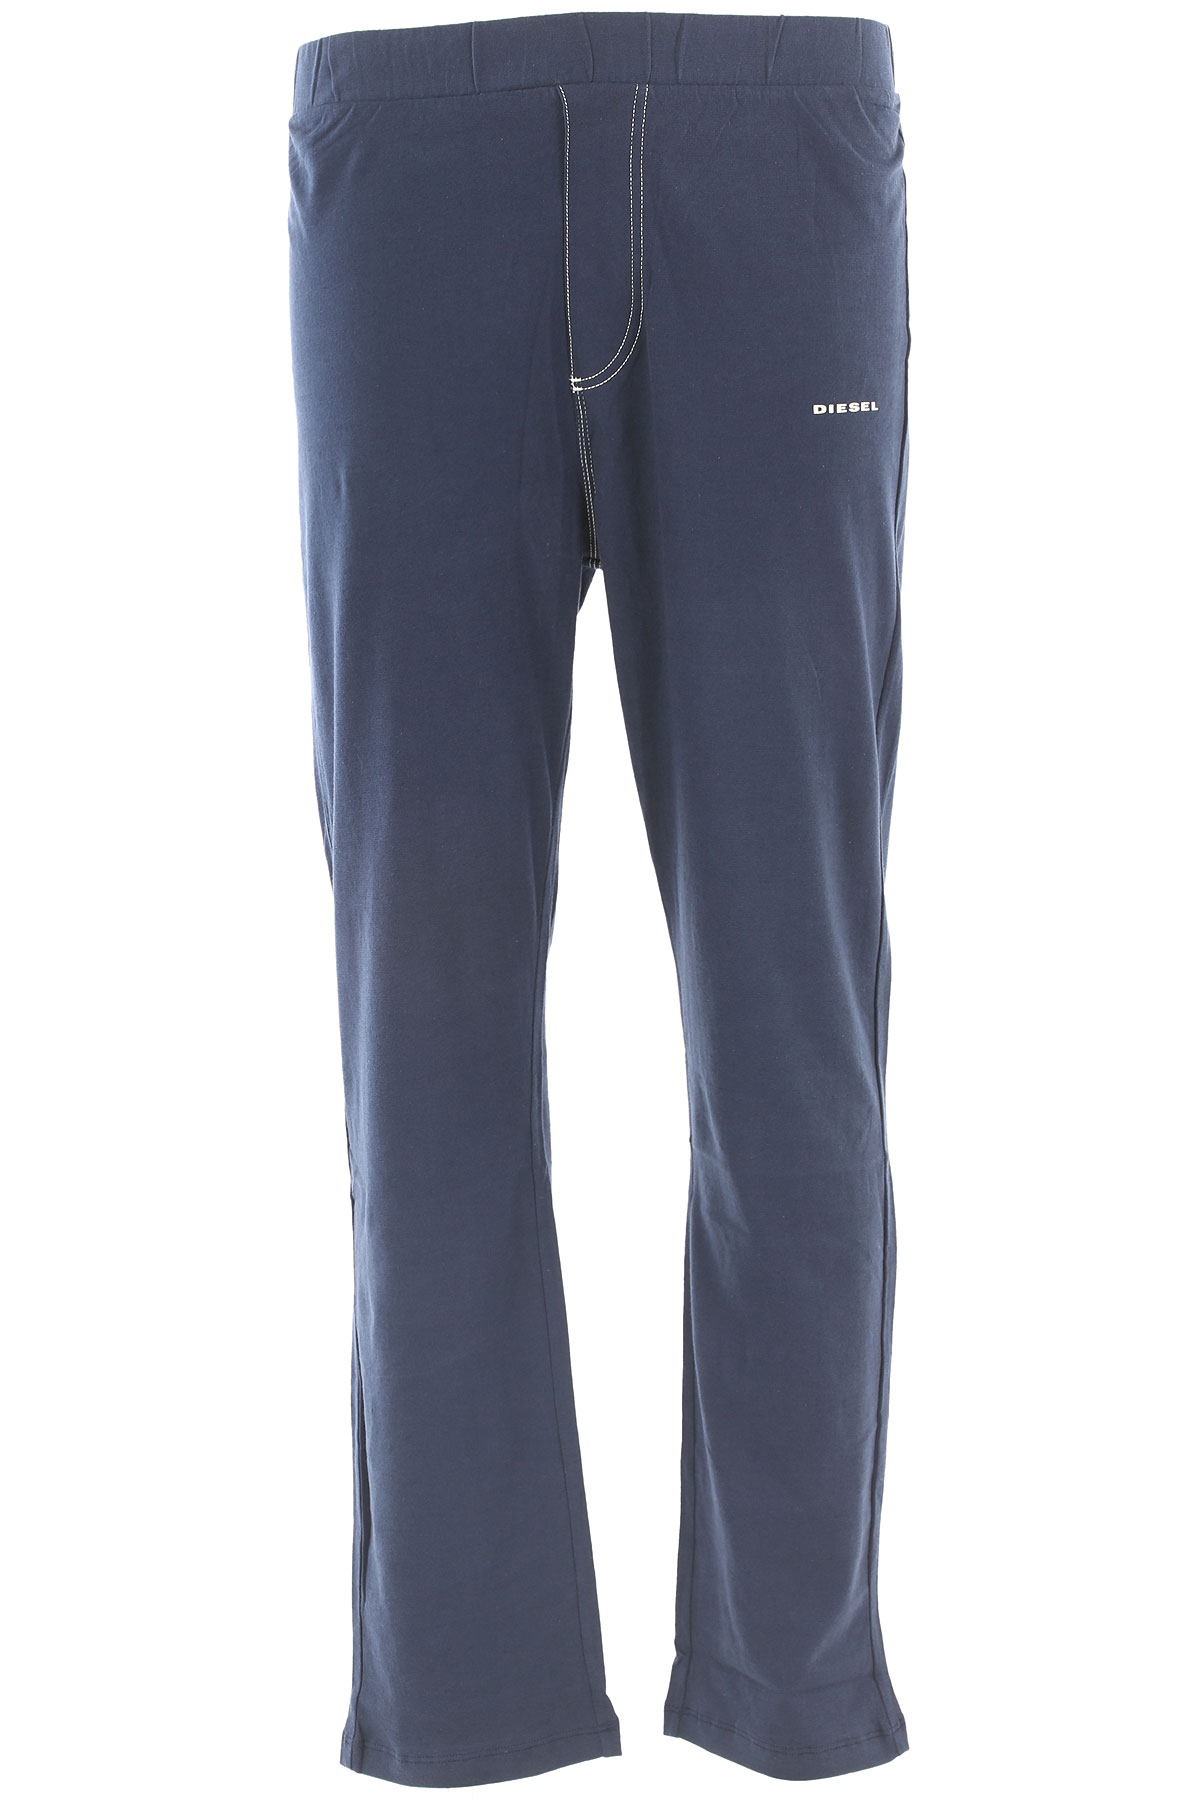 Image of Diesel Loungewear for Men On Sale in Outlet, Blue, Cotton, 2017, M (EU 48) L (EU 50) XL (EU 52)